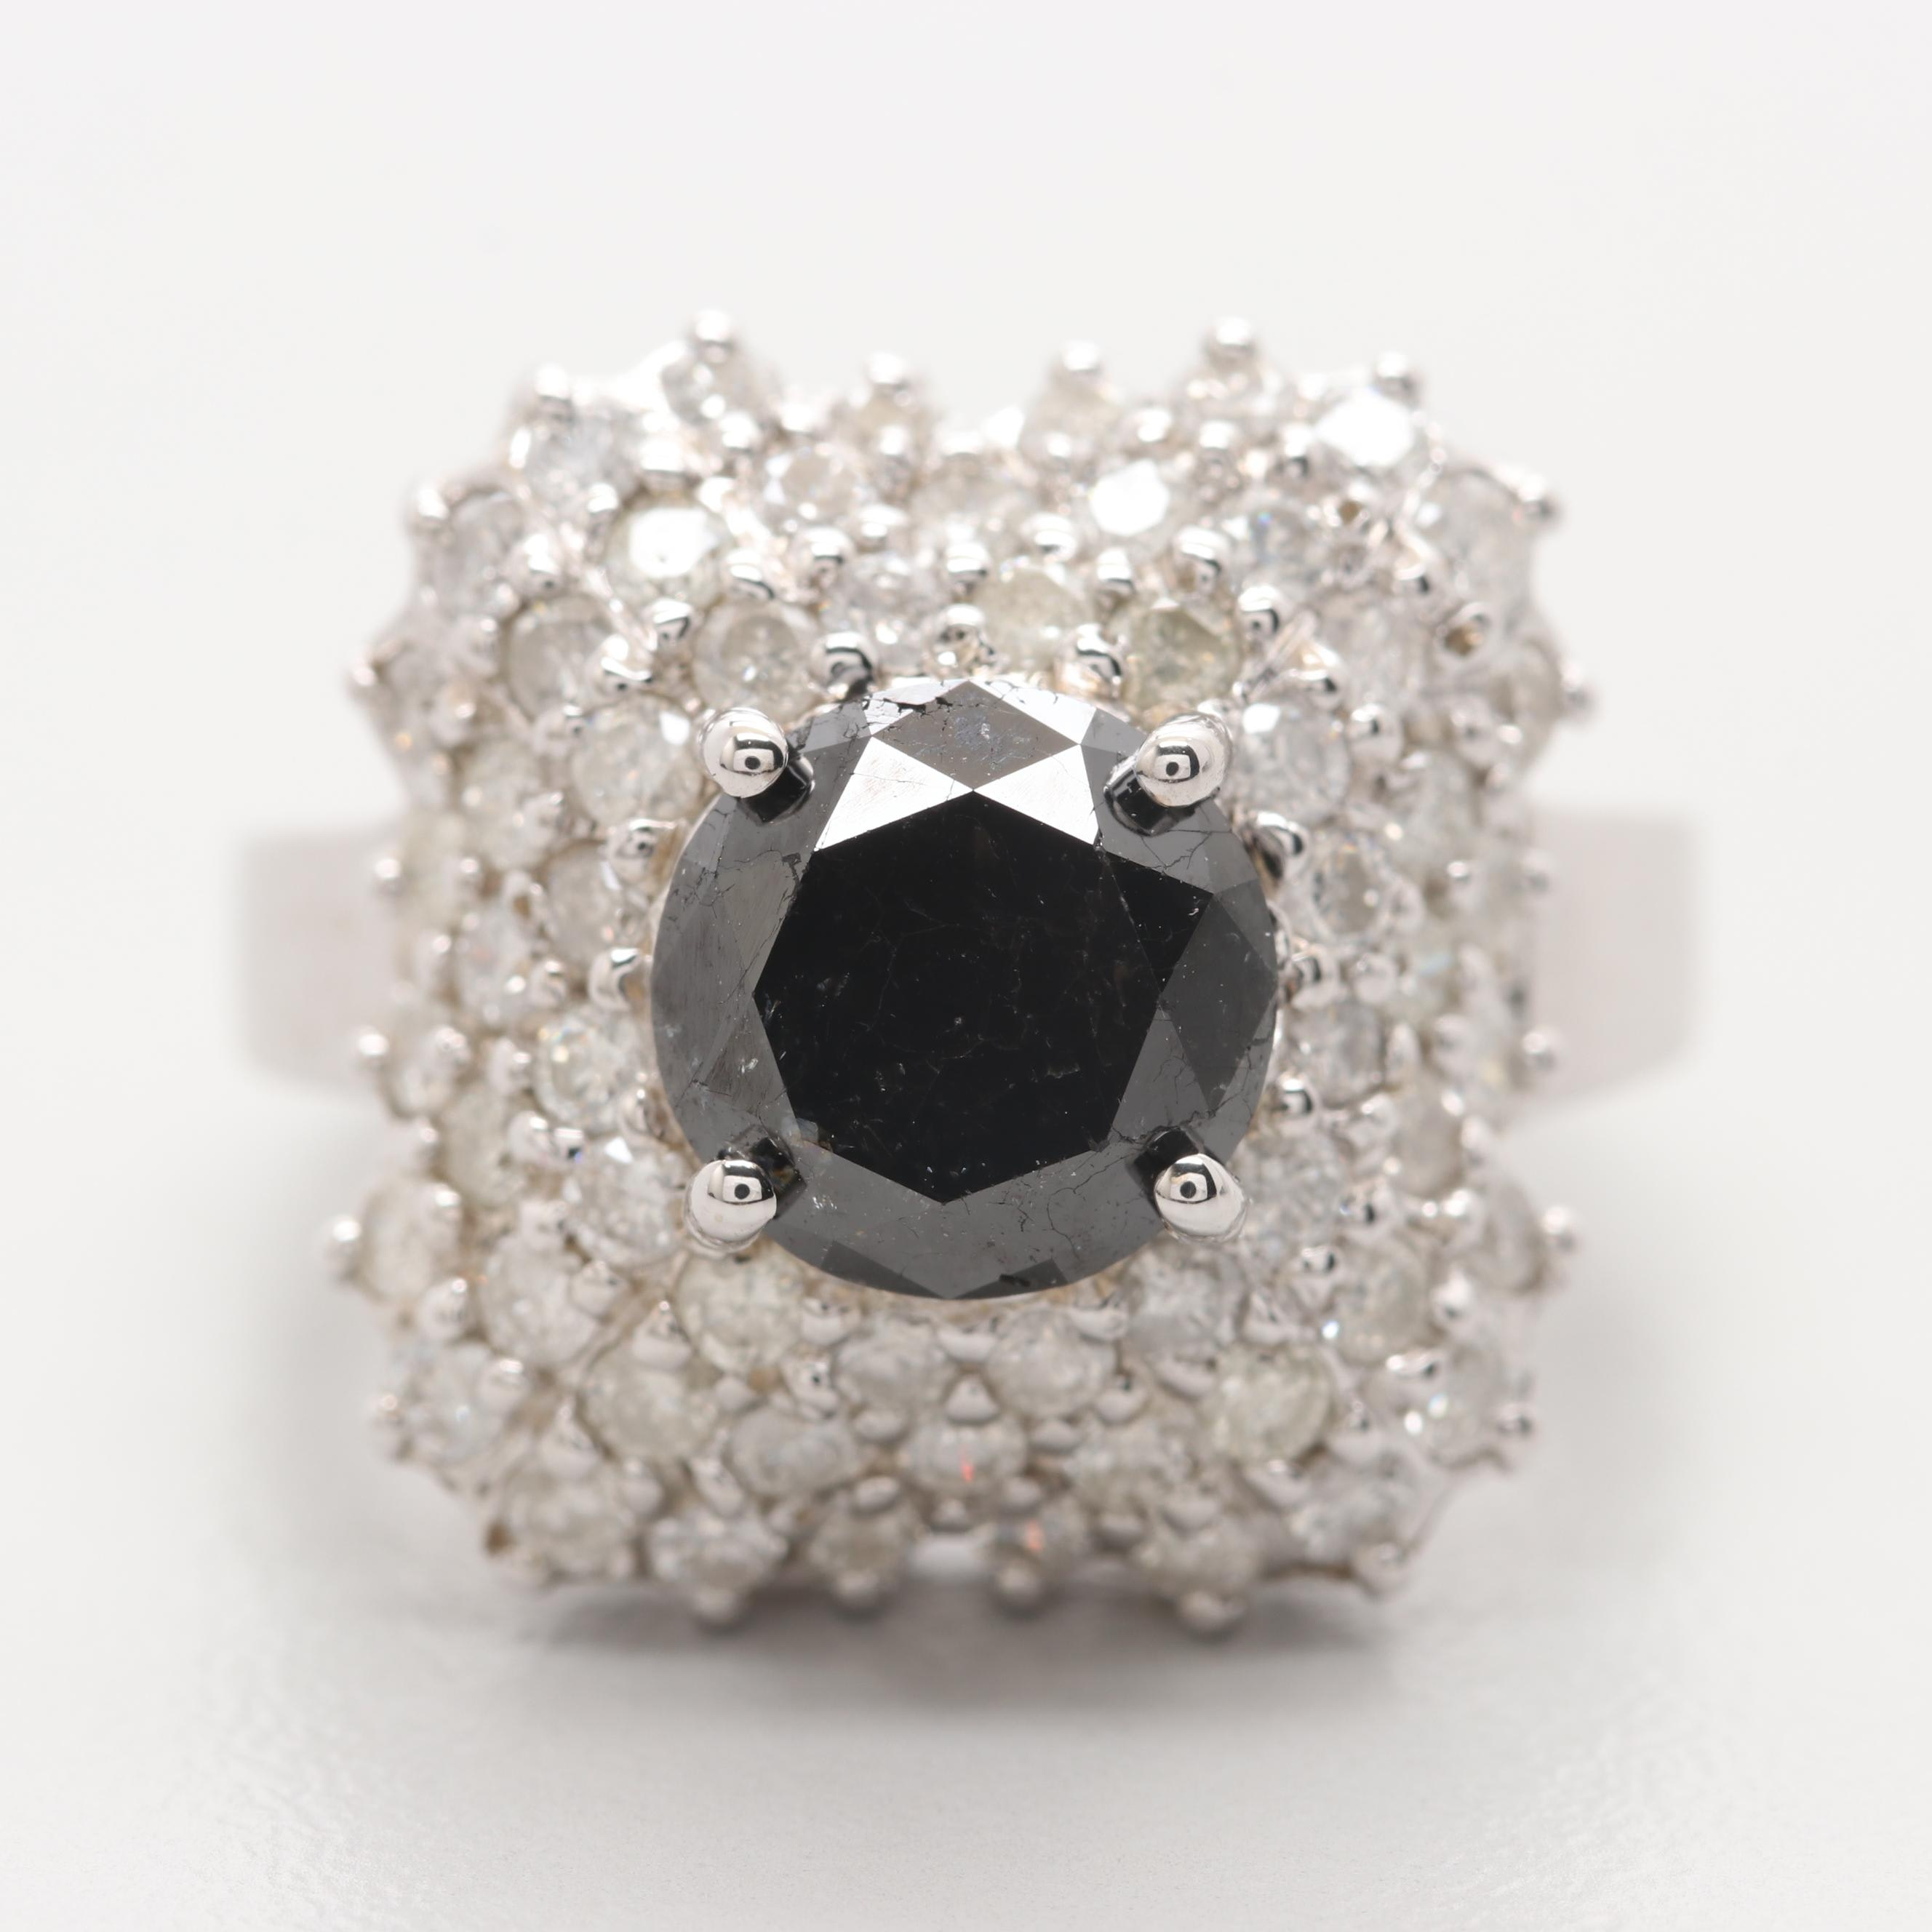 14K White Gold 3.77 CTW Diamond Ring